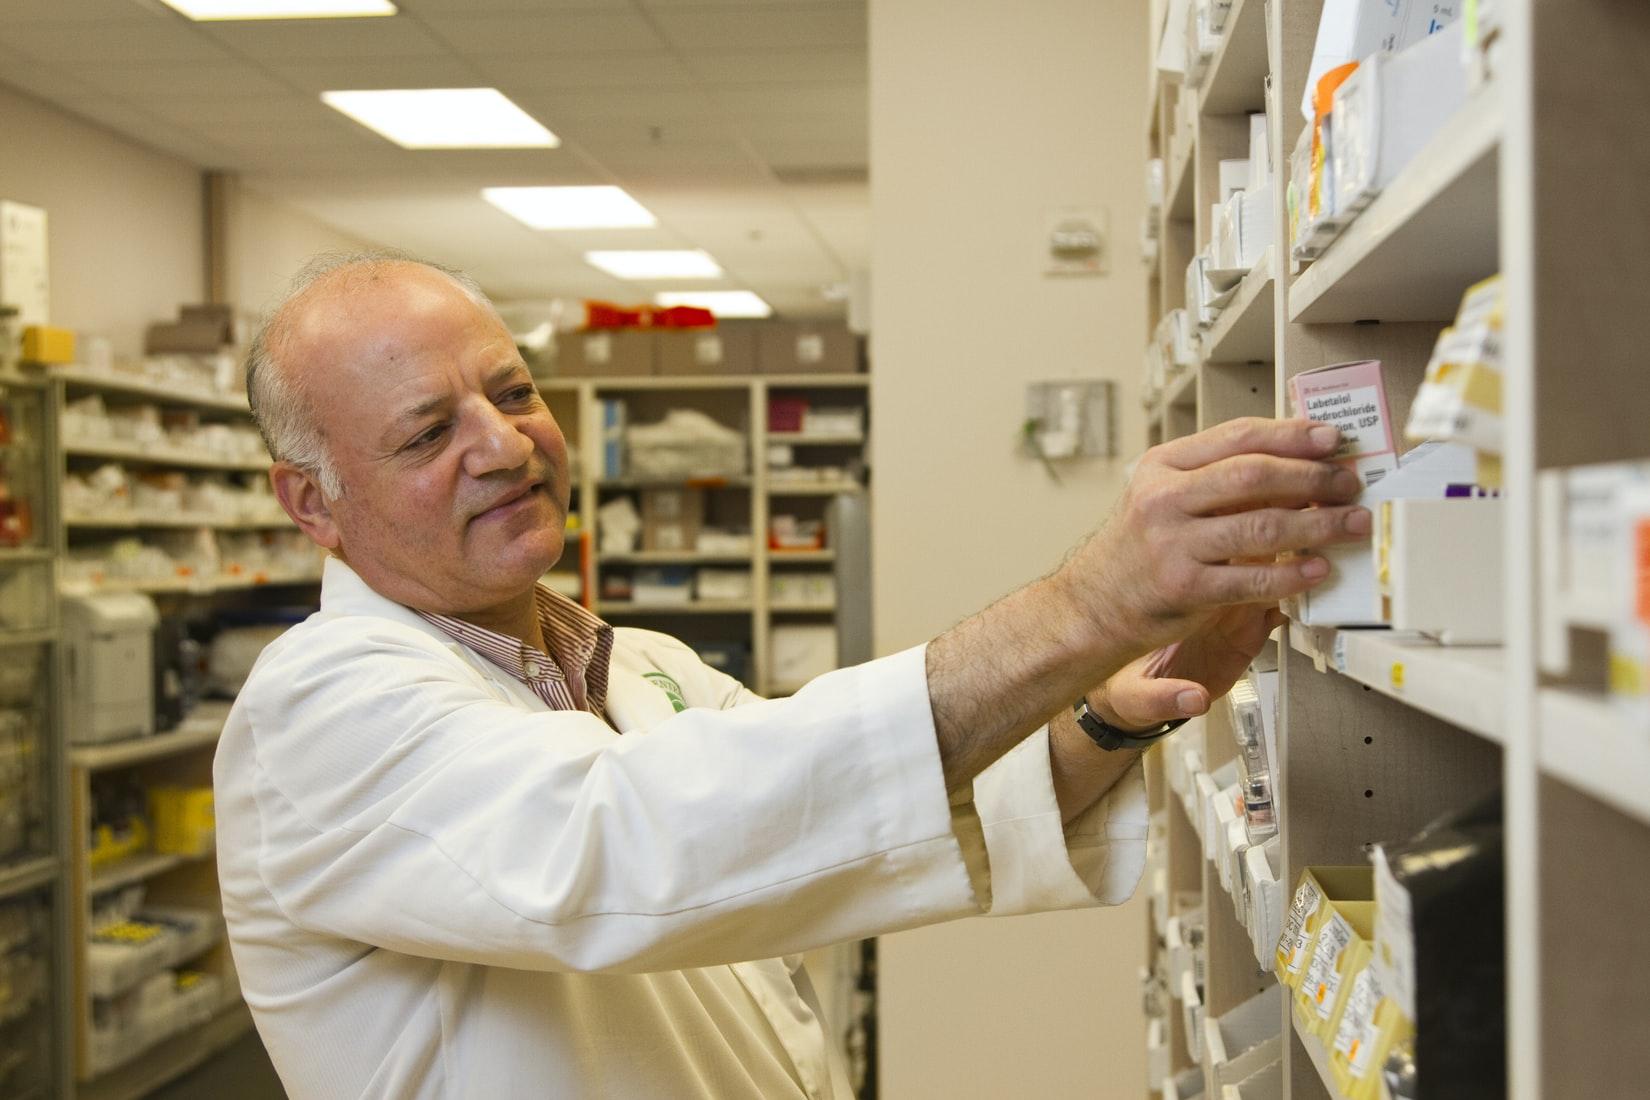 ADQ to acquire Egypt's Amoun Pharmaceutical Company